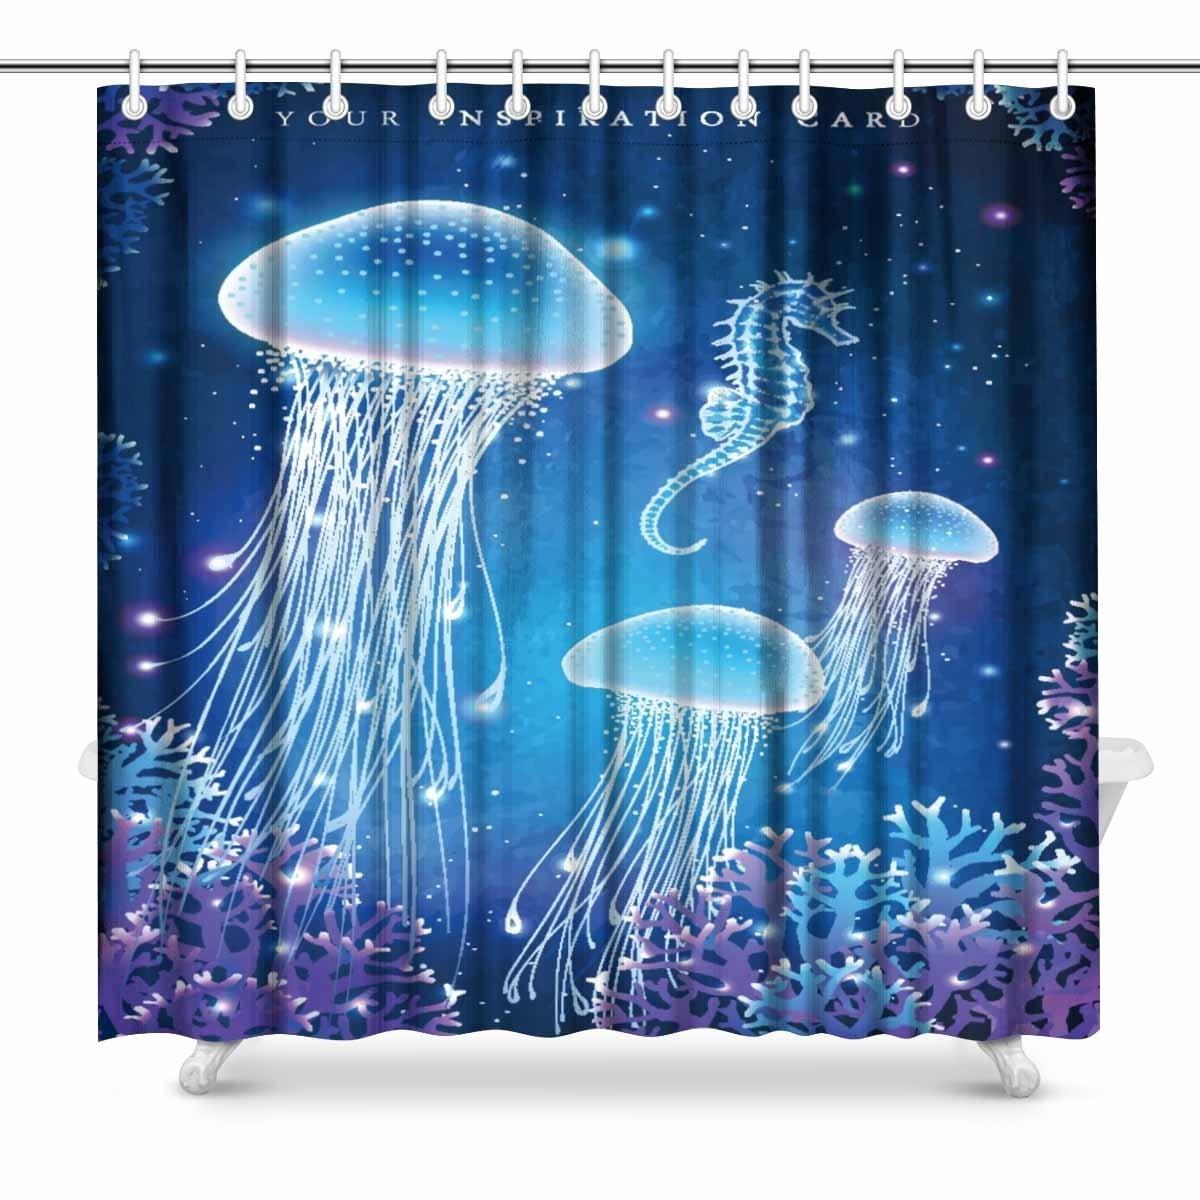 Set de cortina de ducha de decoración submarina para baño de Aplysia Magic Medusa resplandeciente